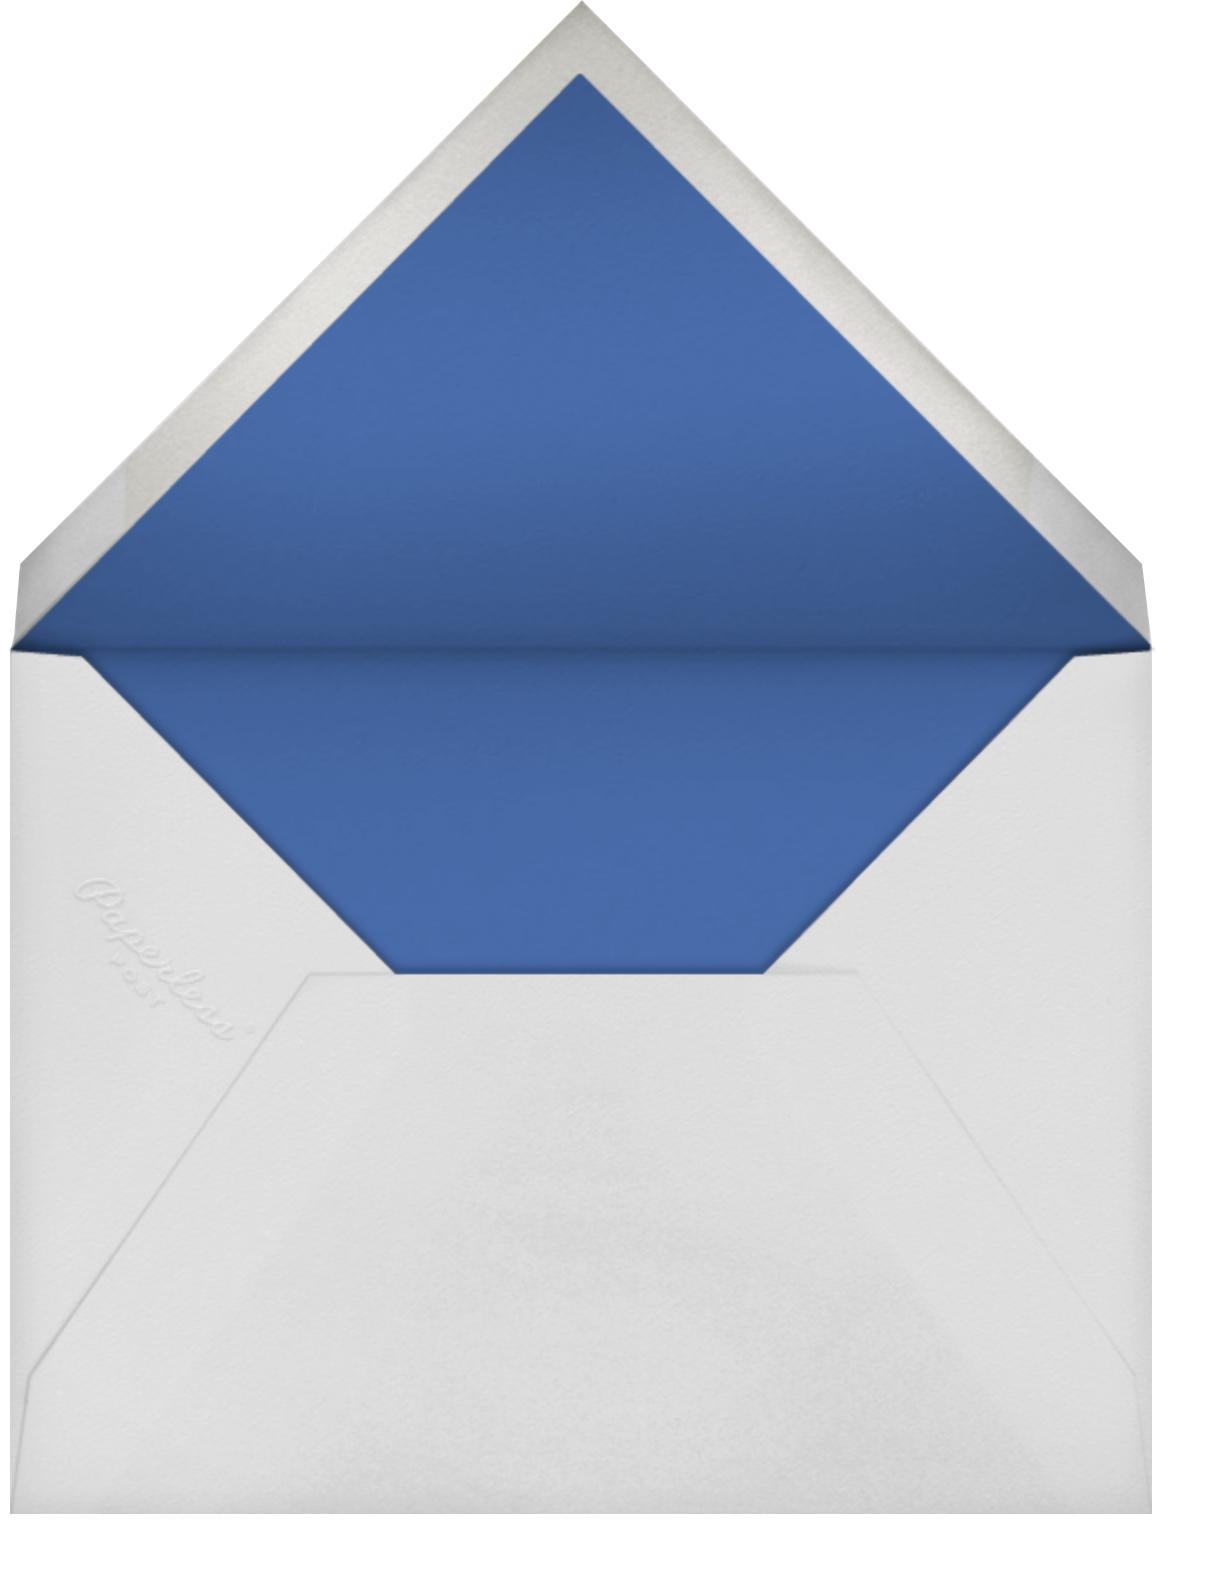 Ottoman Floral - White - Oscar de la Renta - Adult birthday - envelope back